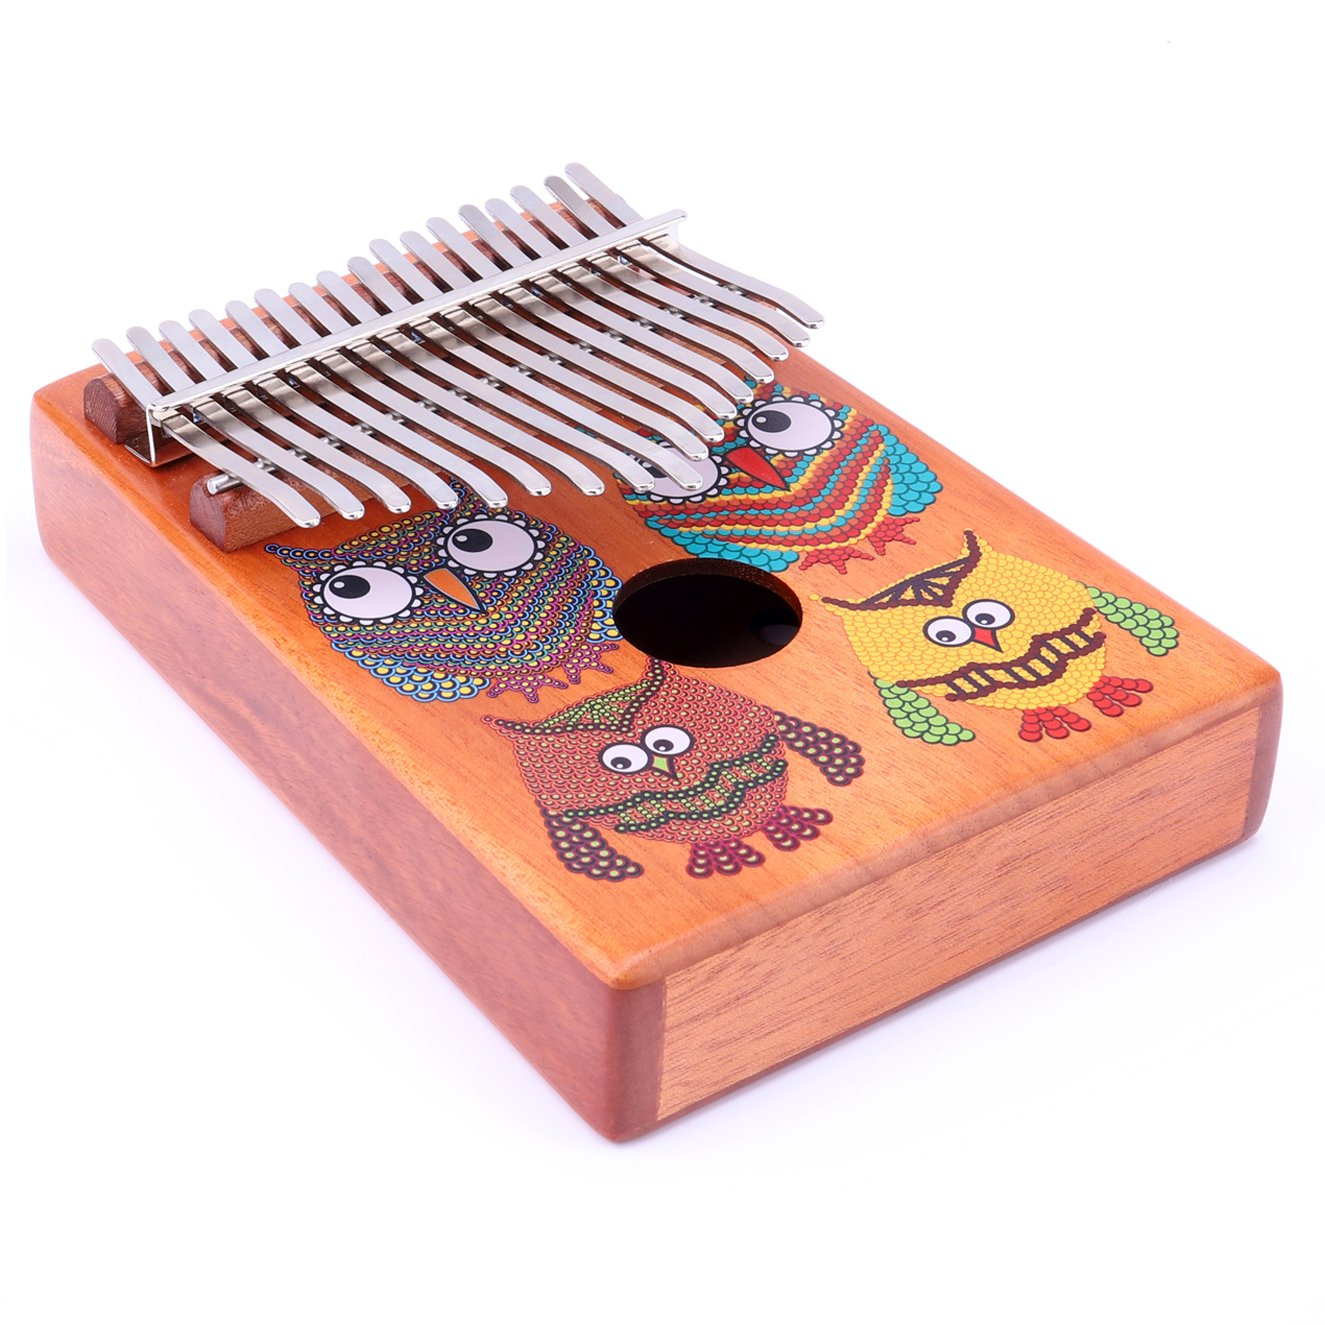 VI VICTORY 17 Key Mahogany Kalimba Colorful African Thumb Piano Finger Percussion Keyboard Music Instruments - Owl by VI VICTORY (Image #5)